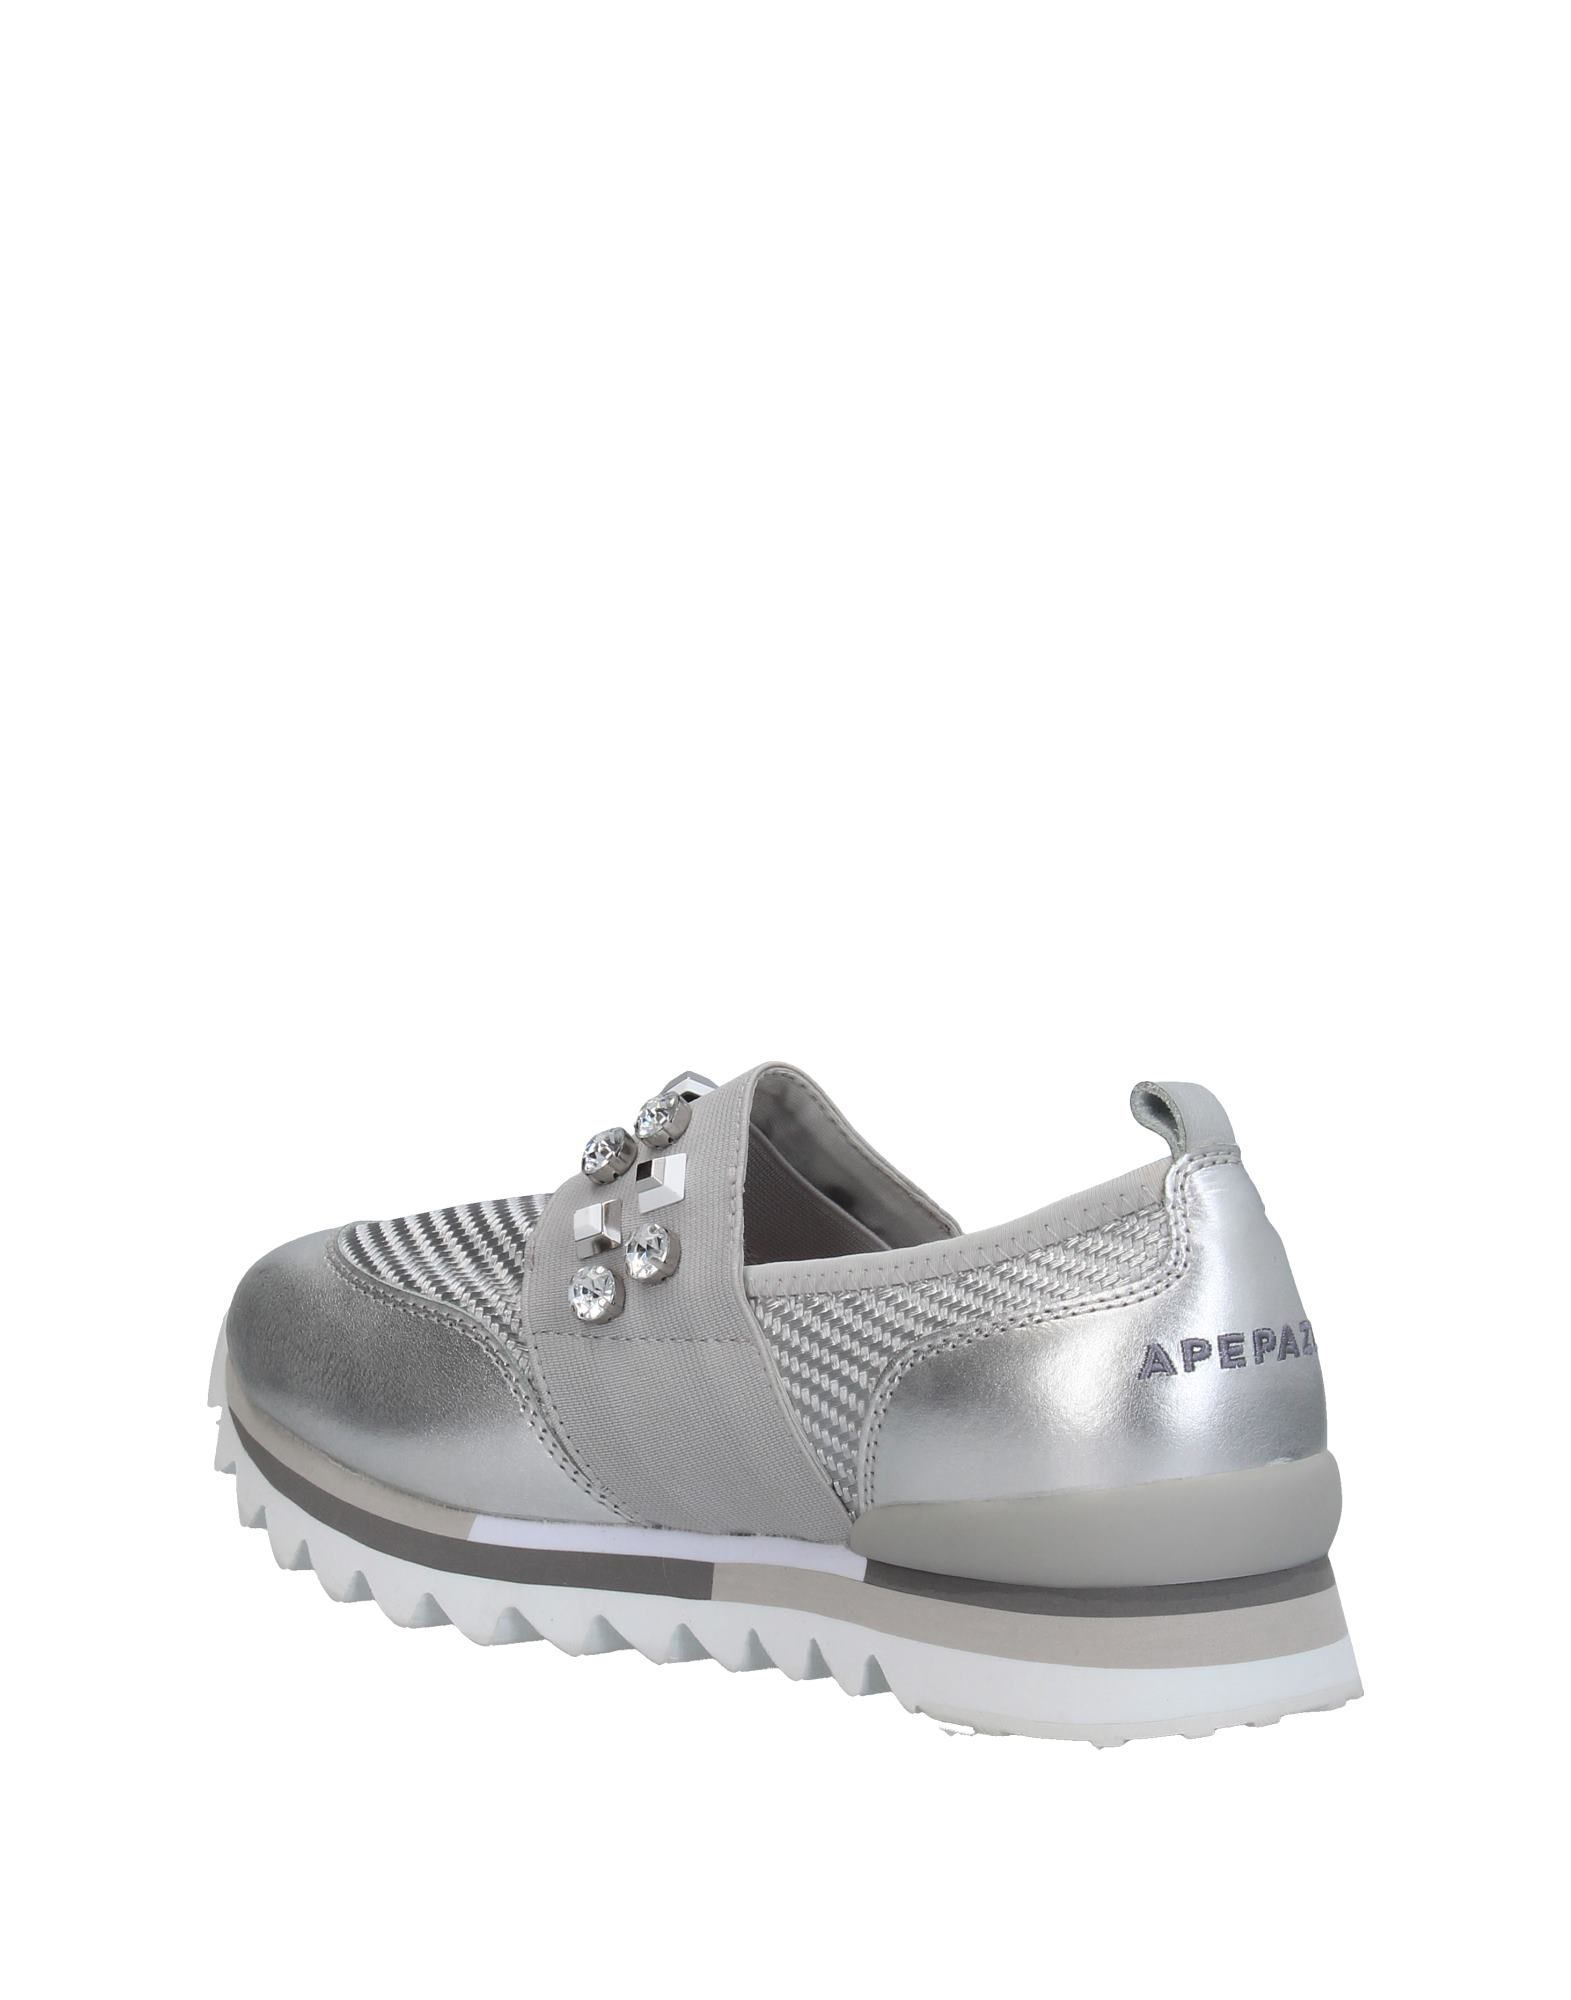 Apepazza Sneakers Damen Damen Sneakers  11393948GH  893e79